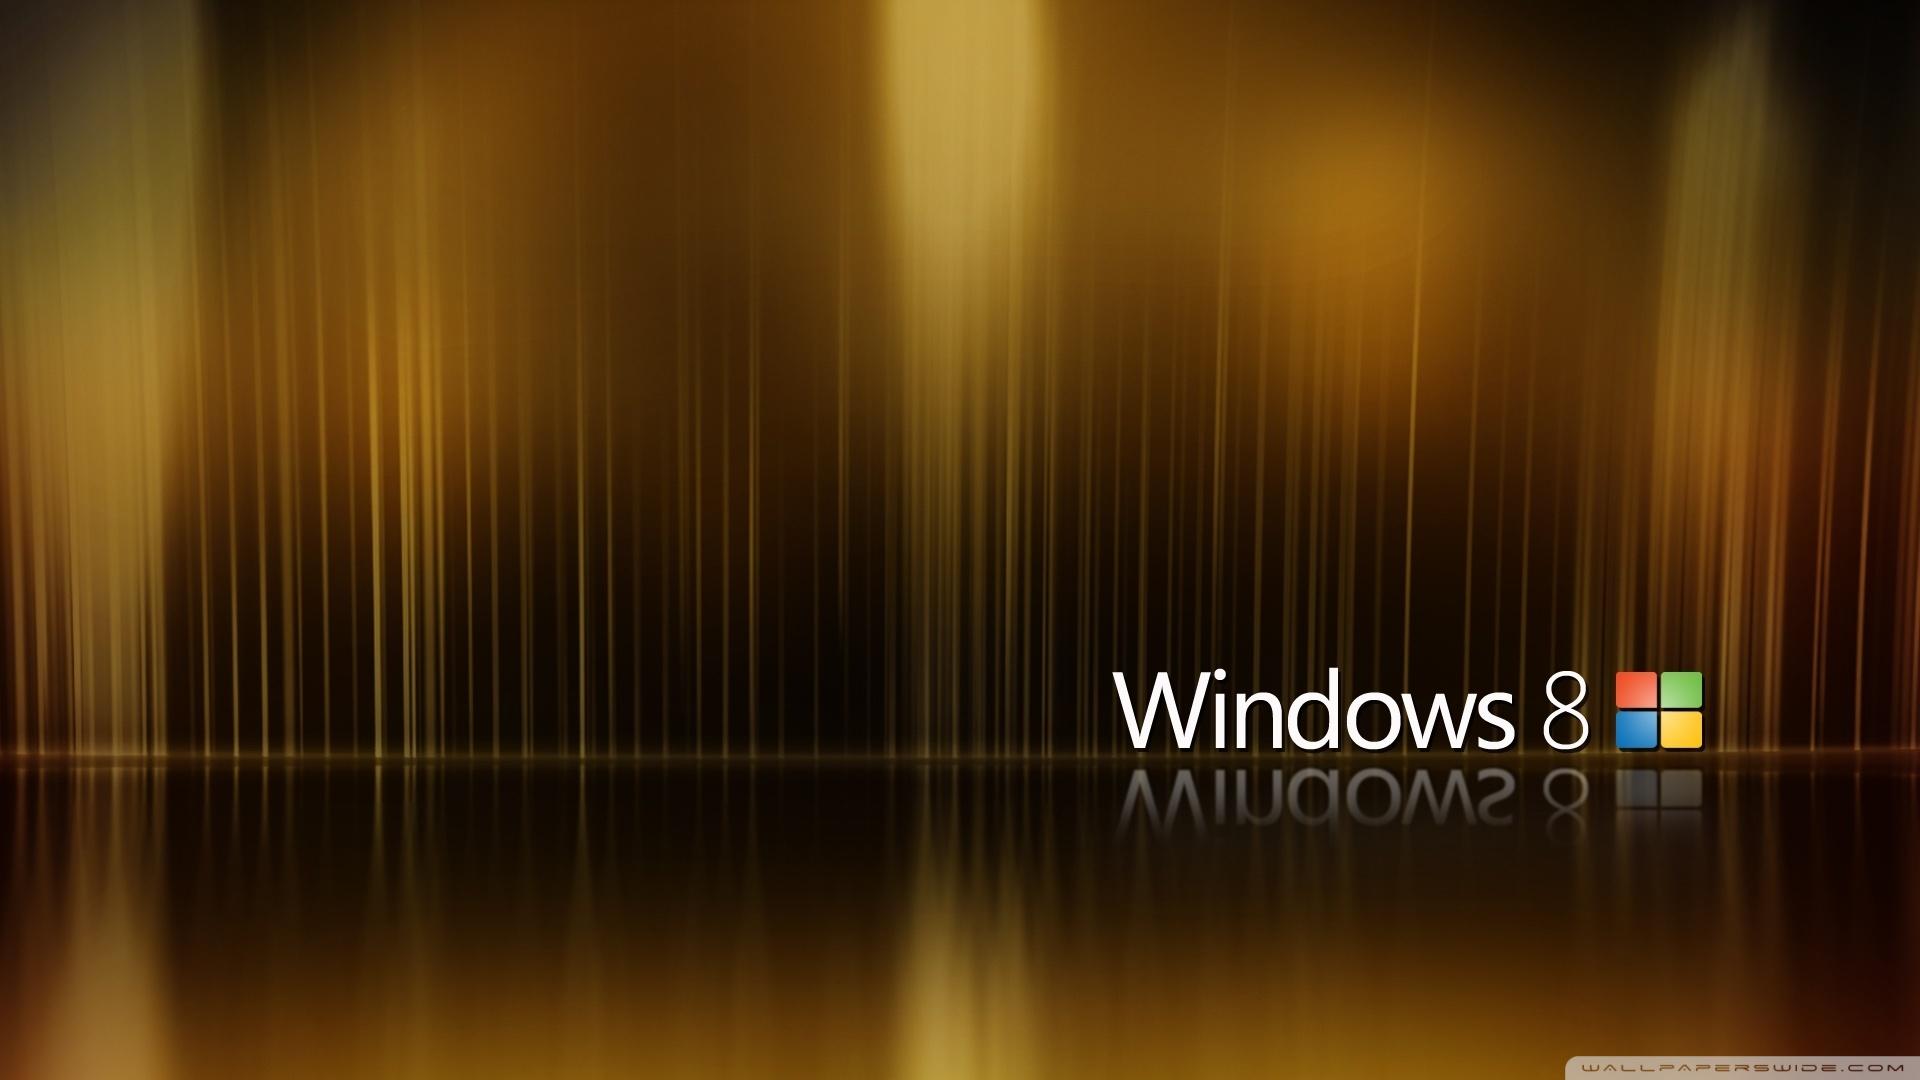 Windows 8 Wallpapers HD QVW2PEL   4USkY 1920x1080